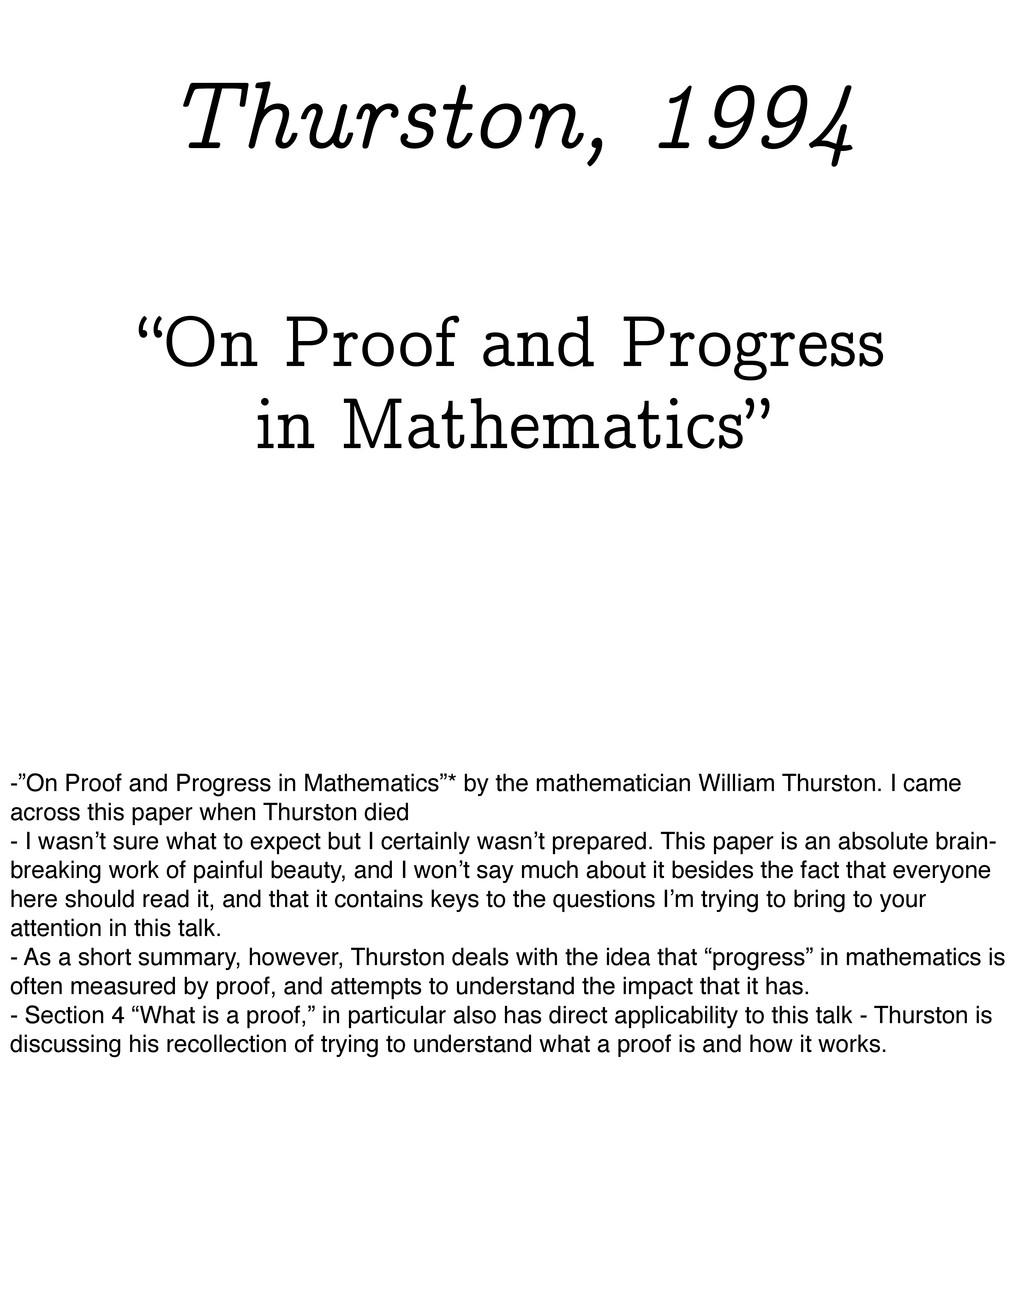 """On Proof and Progress in Mathematics"" Thurston..."